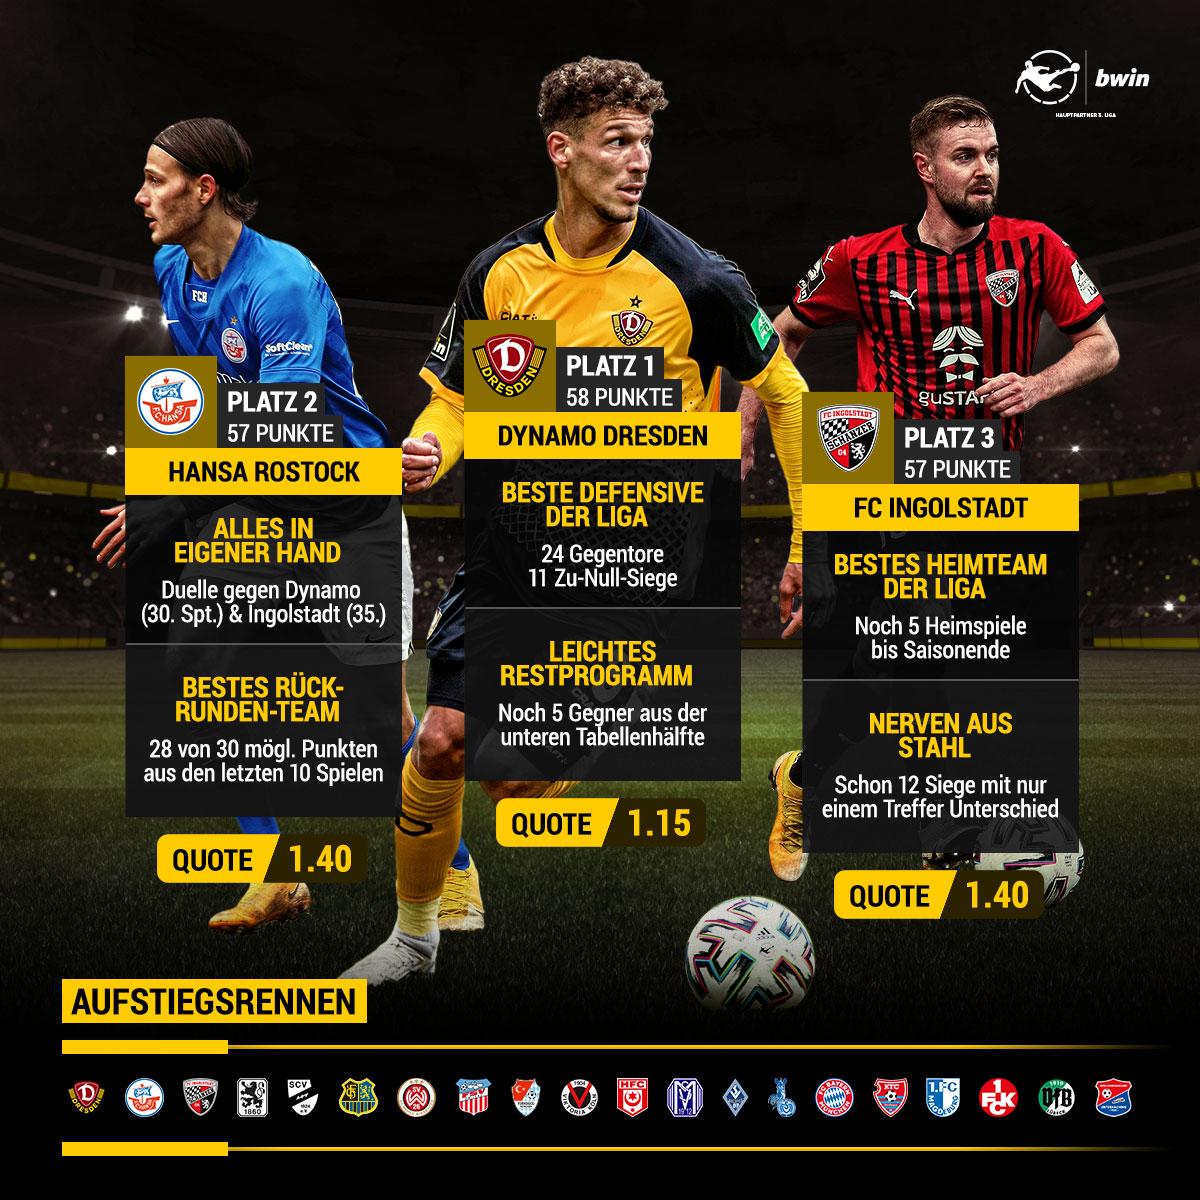 Aufstiegskampf 3. Liga